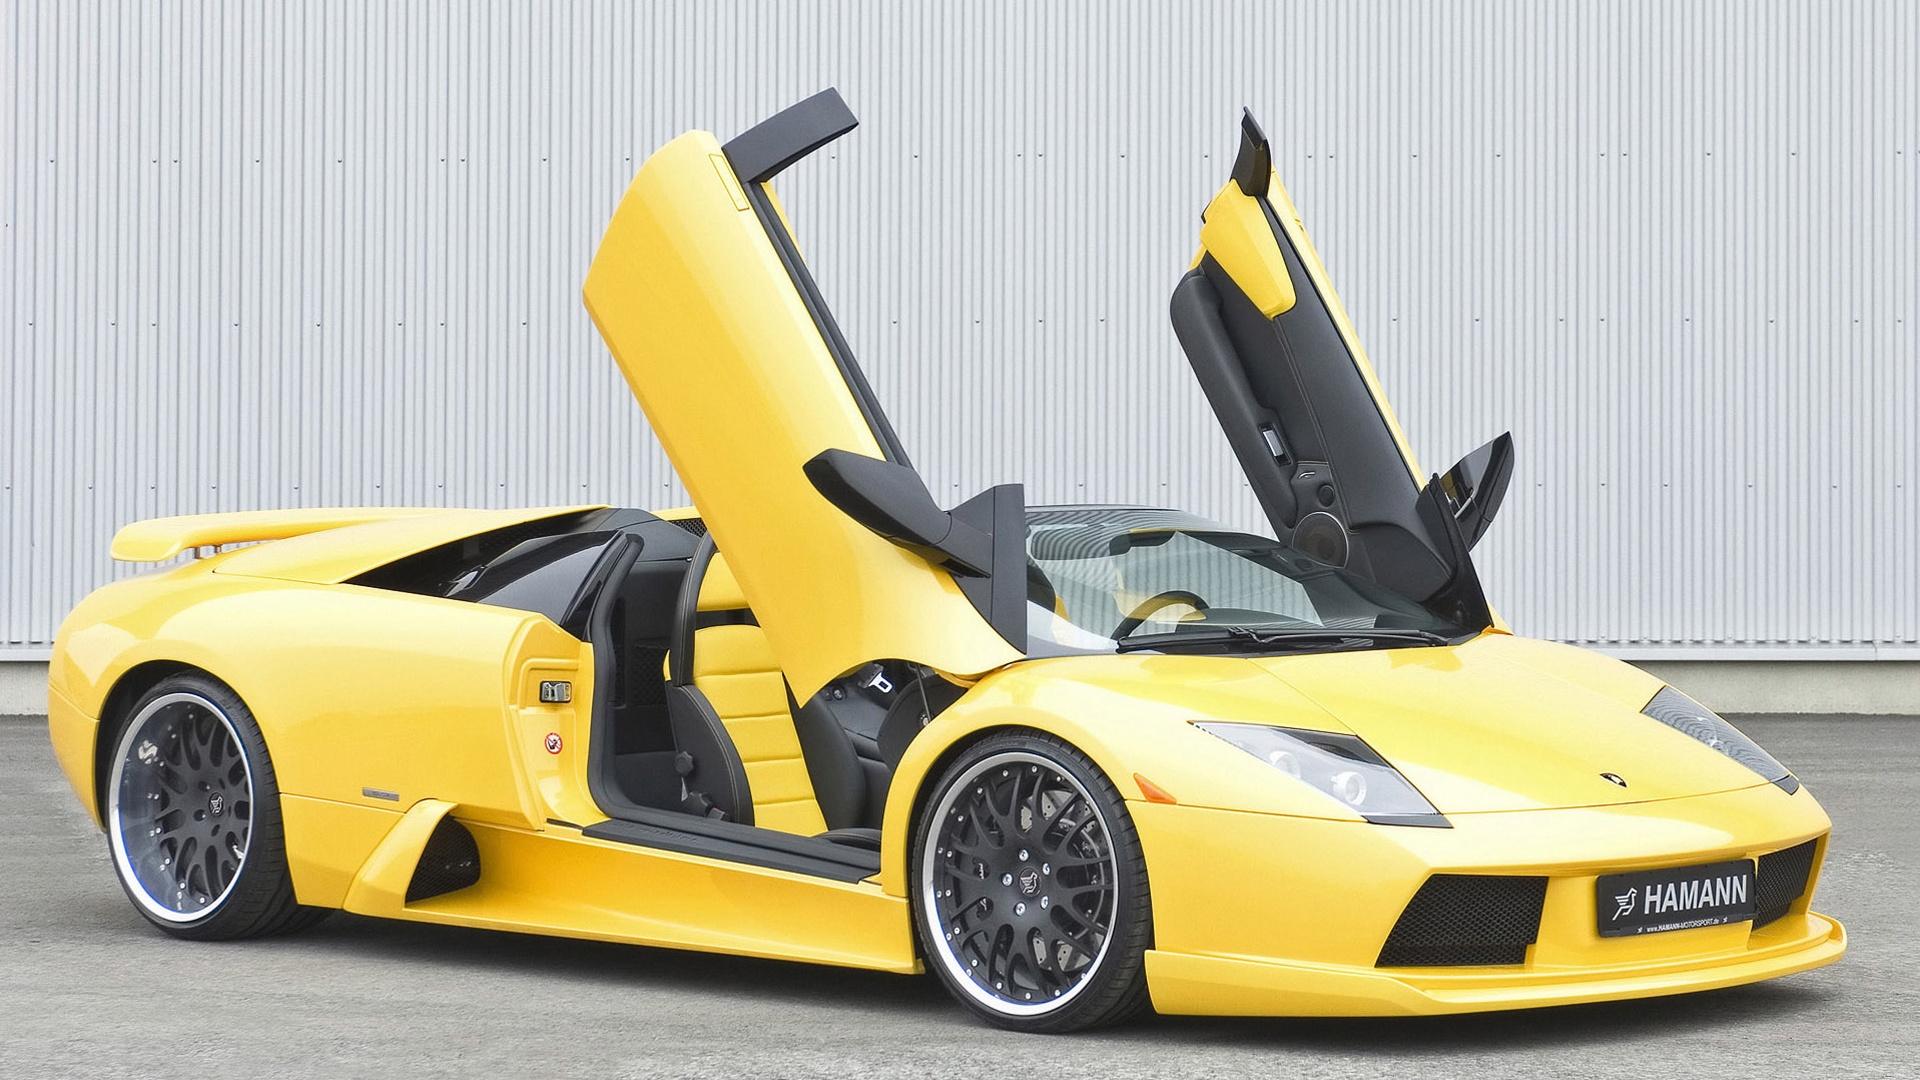 Yellow Lamborghini wallpaper 1920x1080 4199 1920x1080